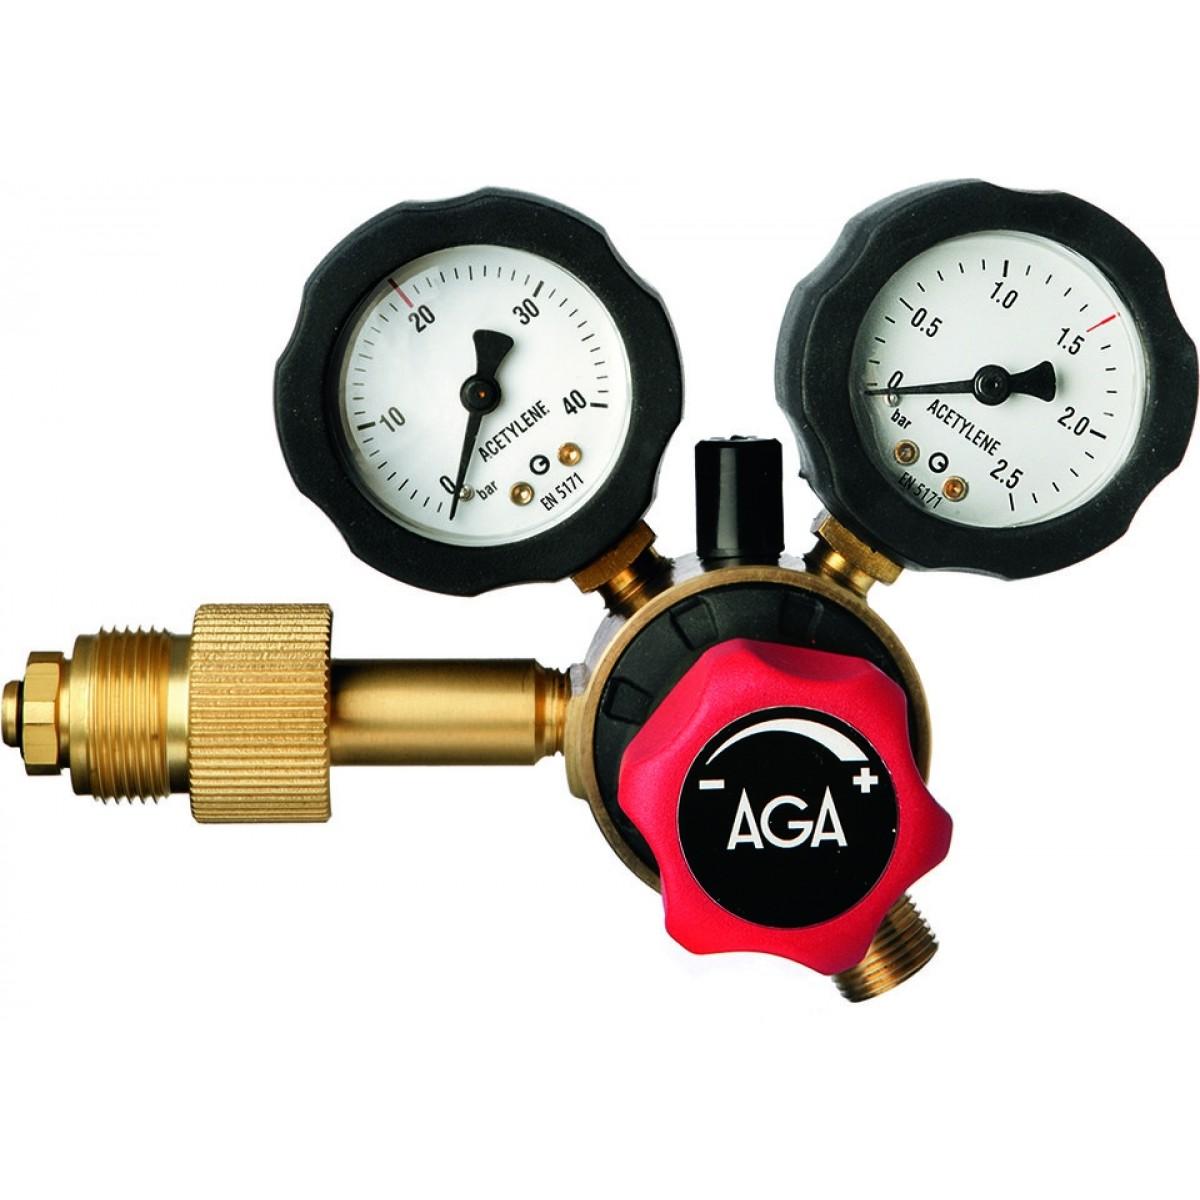 Gas regulator Fixicontrol-31